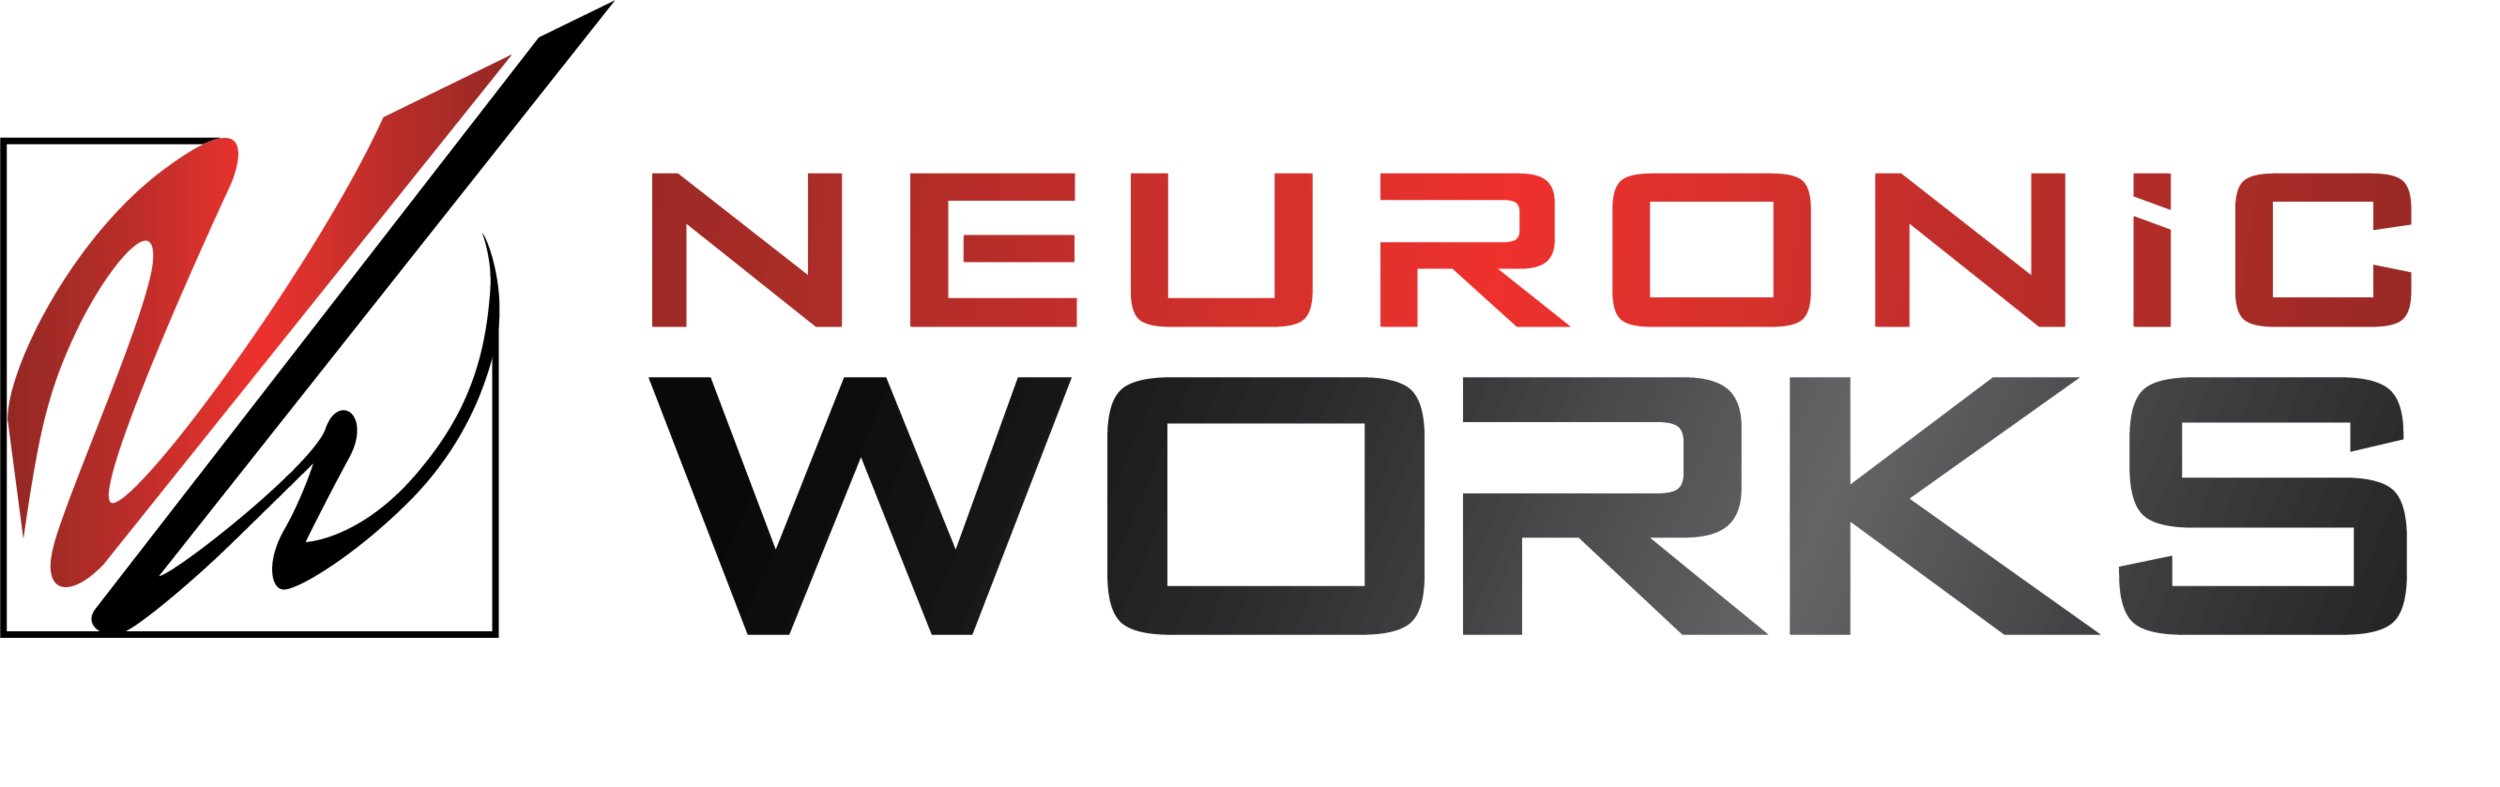 NeuronicWorks_Logo_black.png